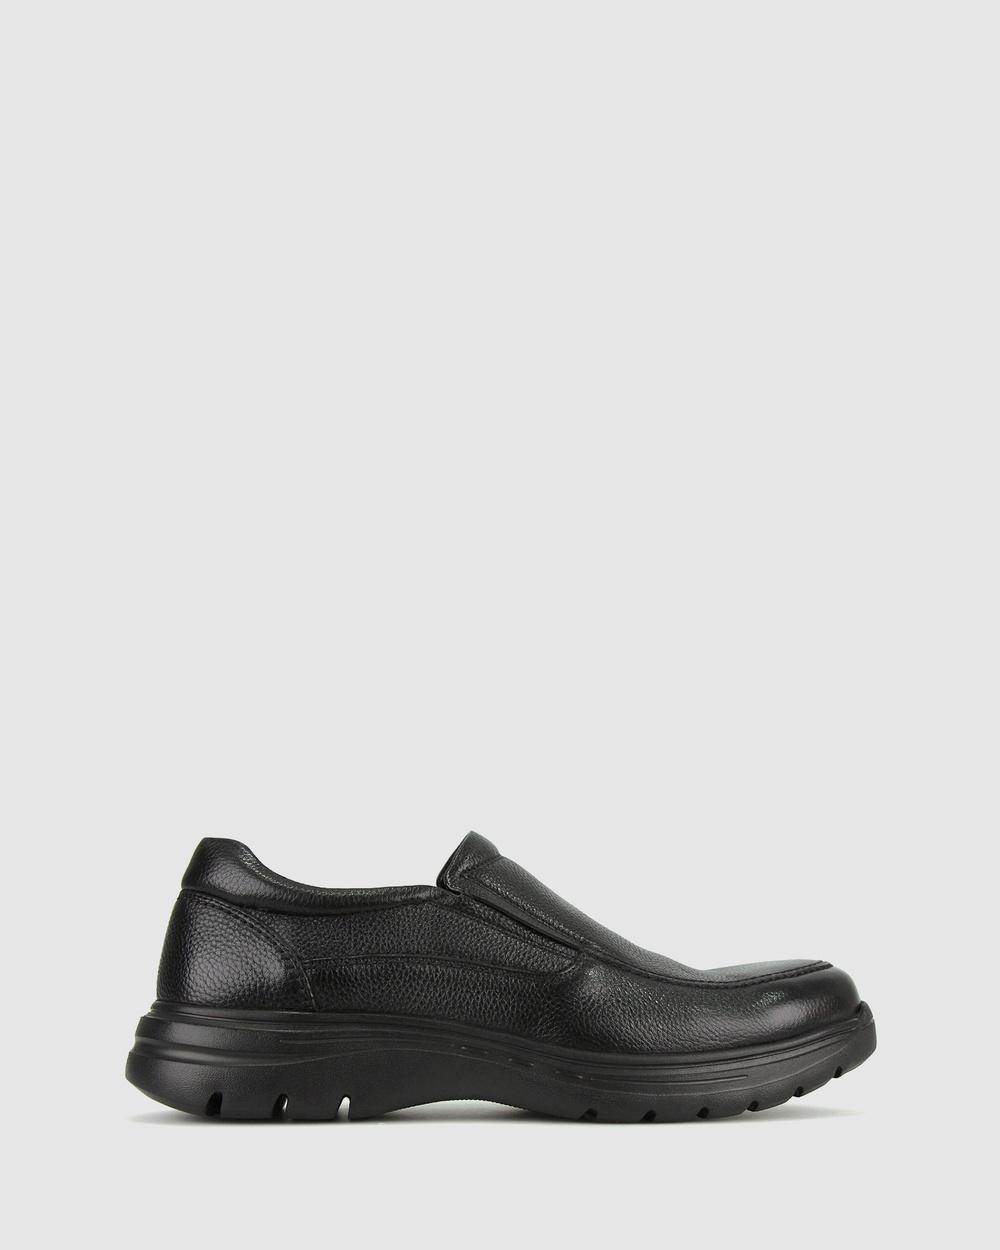 Airflex Steven Leather Loafers Flats Black